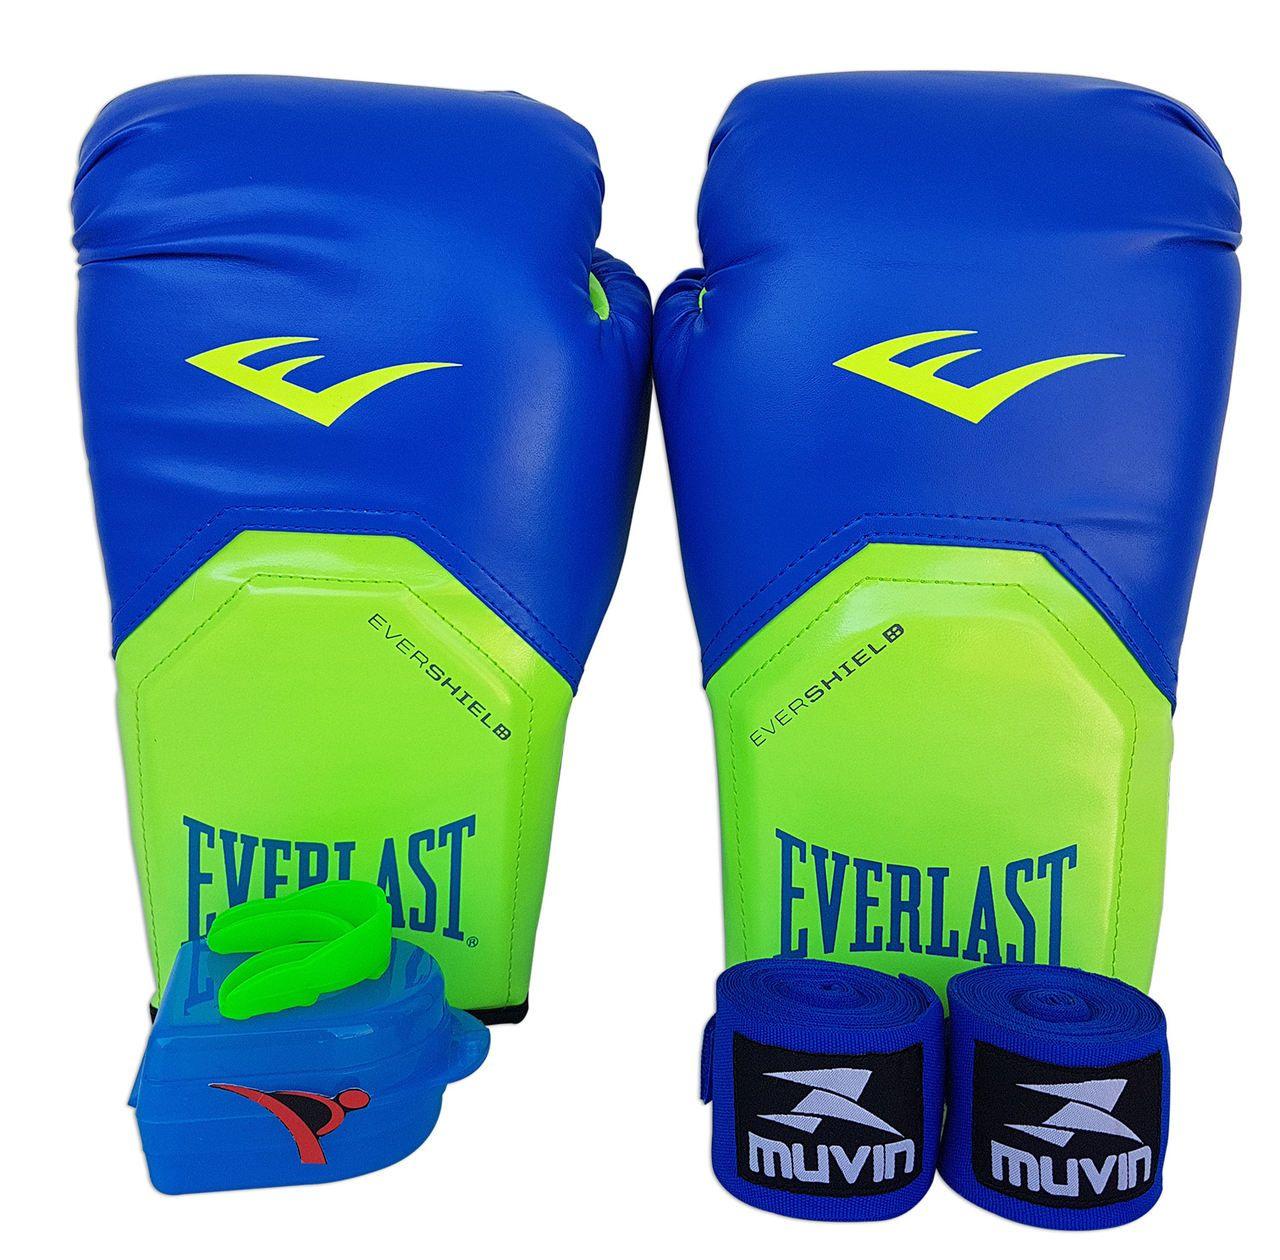 Kit de Boxe / Muay Thai 12oz - Azul com Verde - Pro Style - Everlast  - PRALUTA SHOP